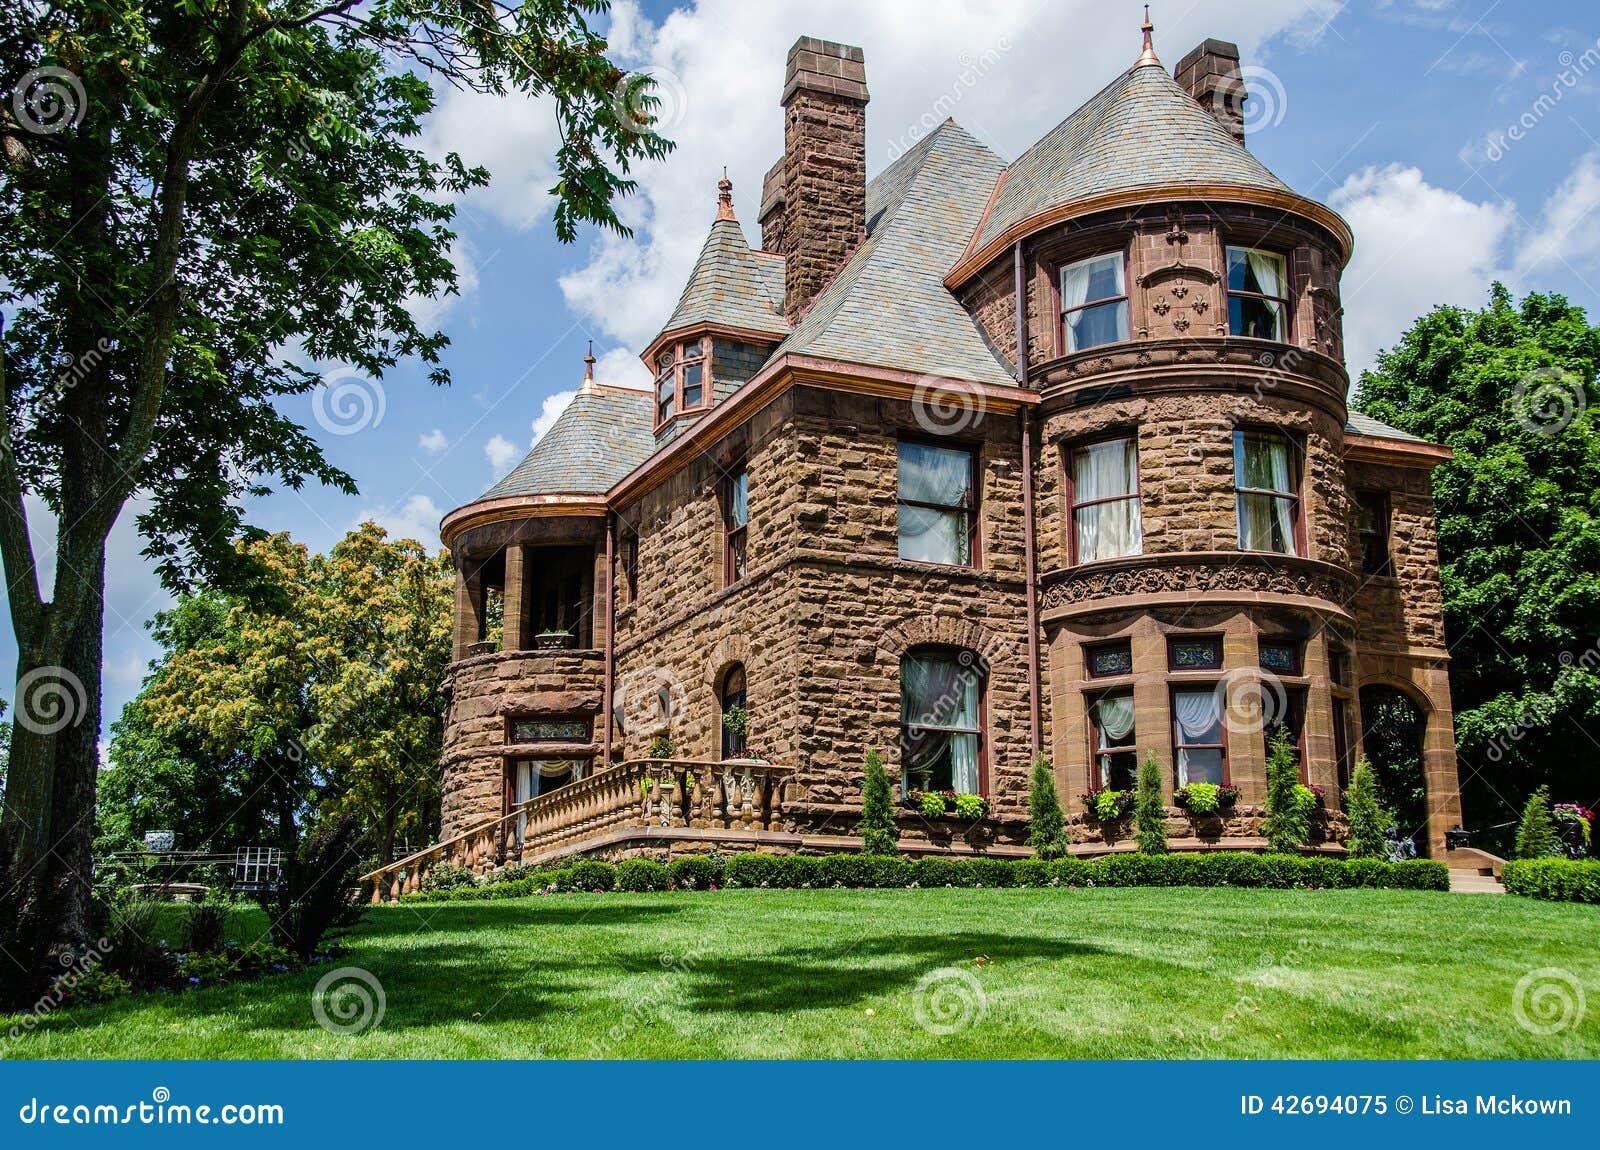 Maison de la reine anne style photo stock image 42694075 for La regina anne house